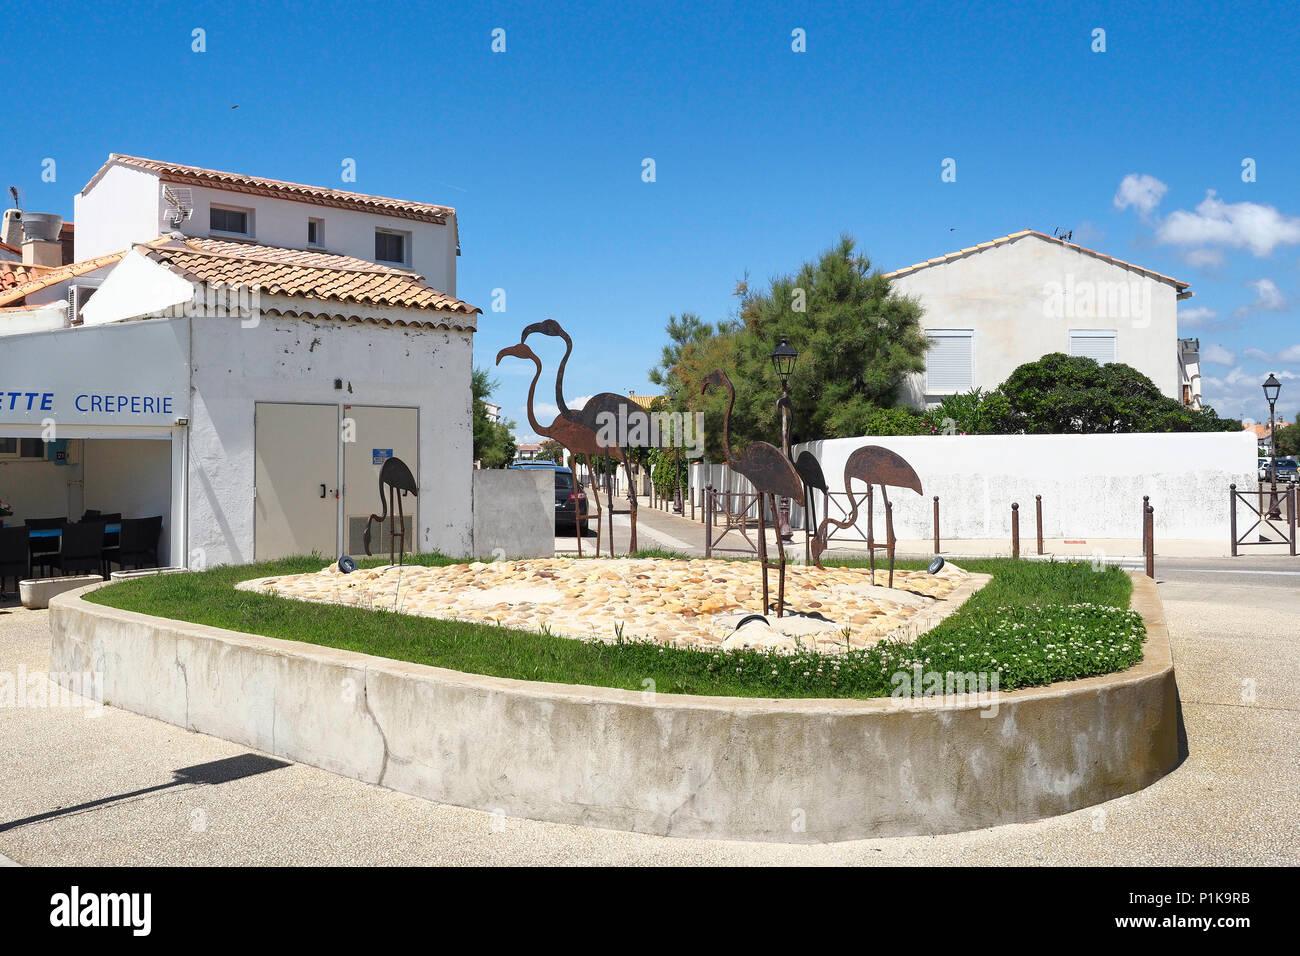 Flamingo Street sculptures Saint Maries de la Mer - Stock Image